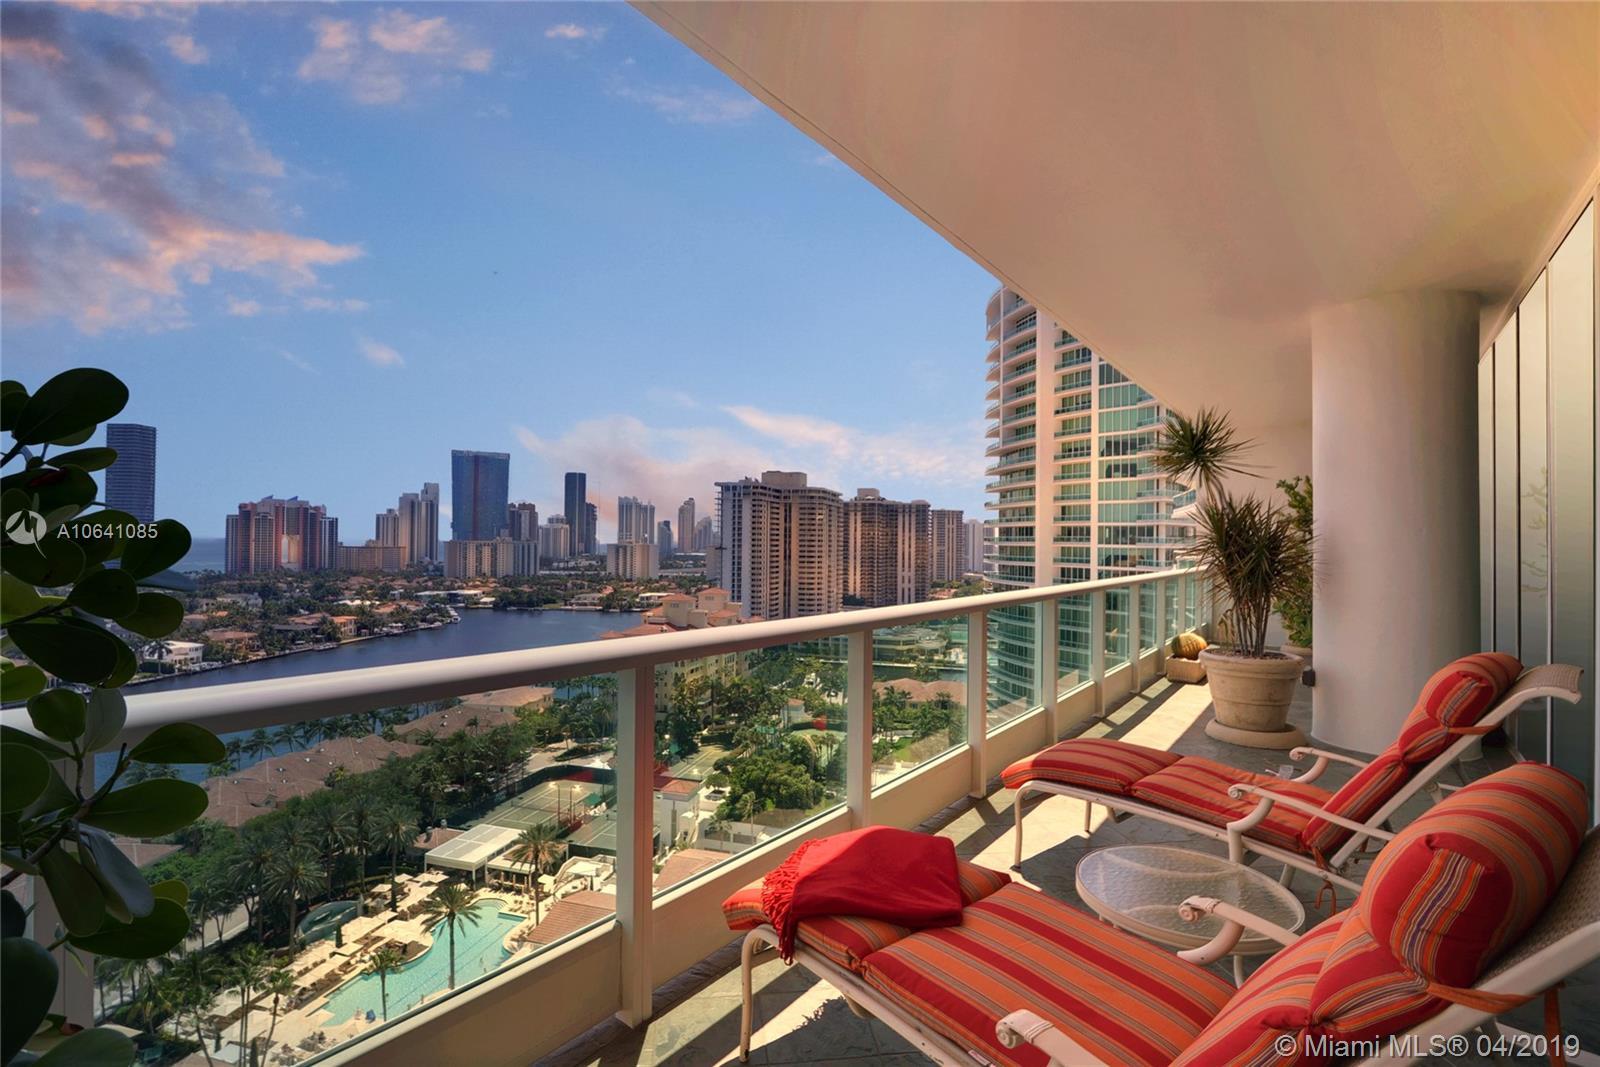 20155 NE 38th Ct #2003, Aventura, FL 33180 - Aventura, FL real estate listing